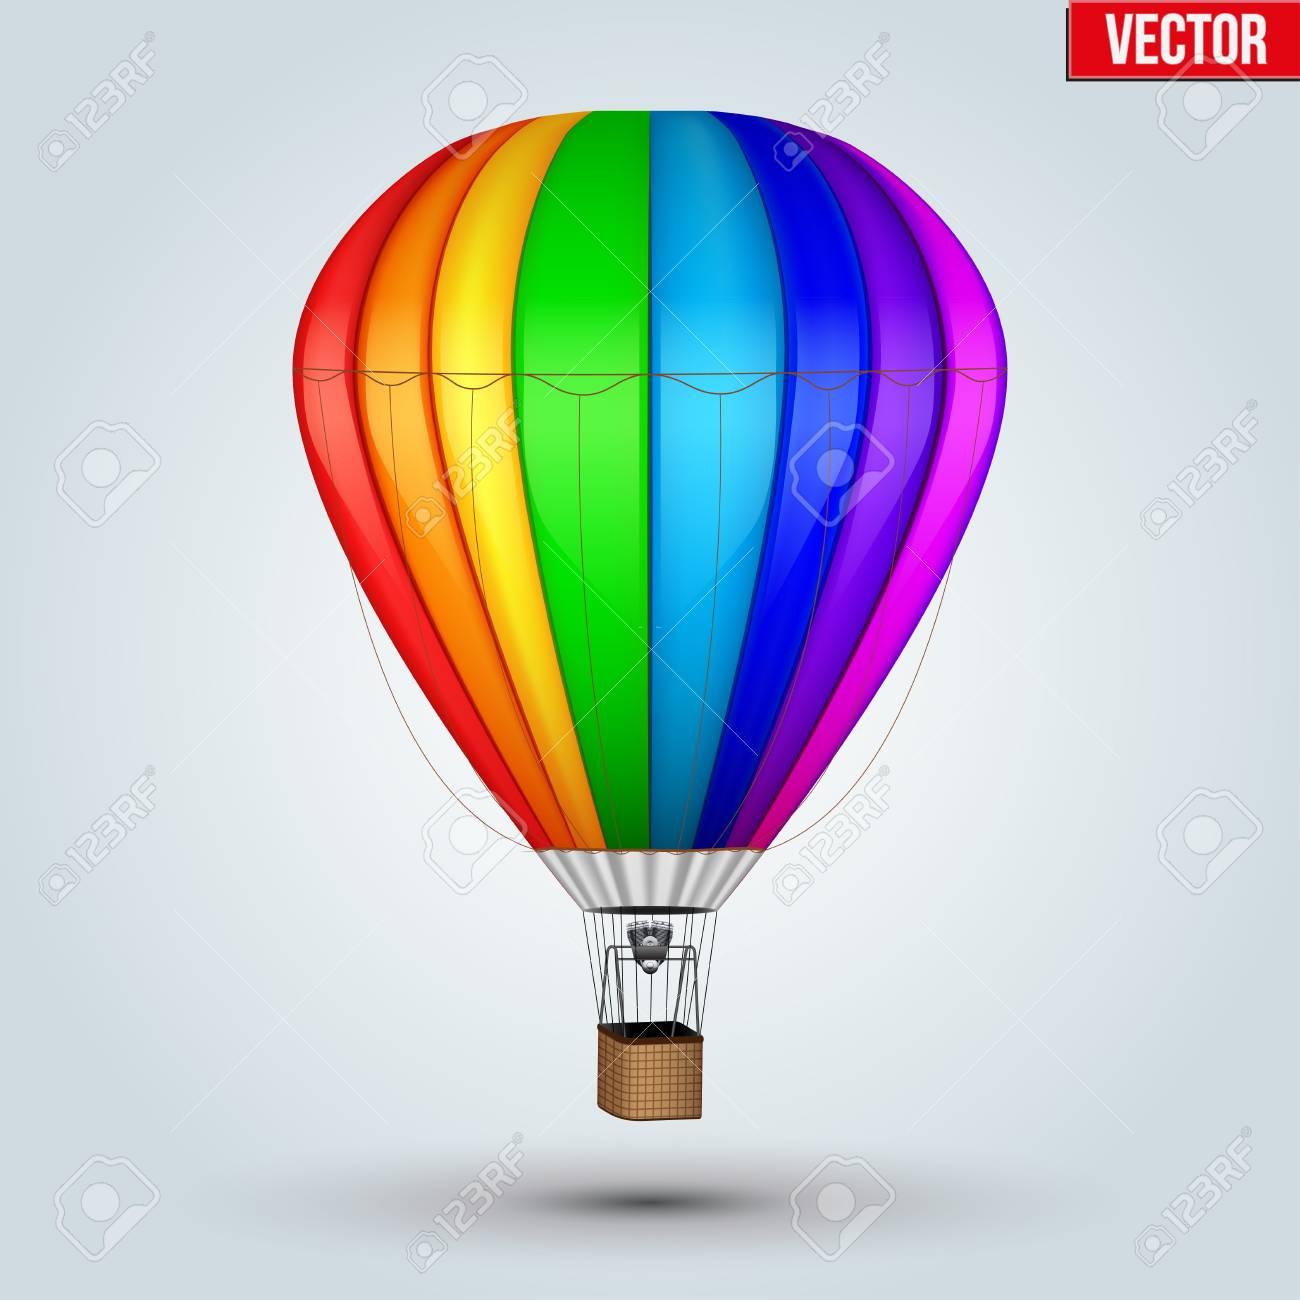 montgolfiere 974